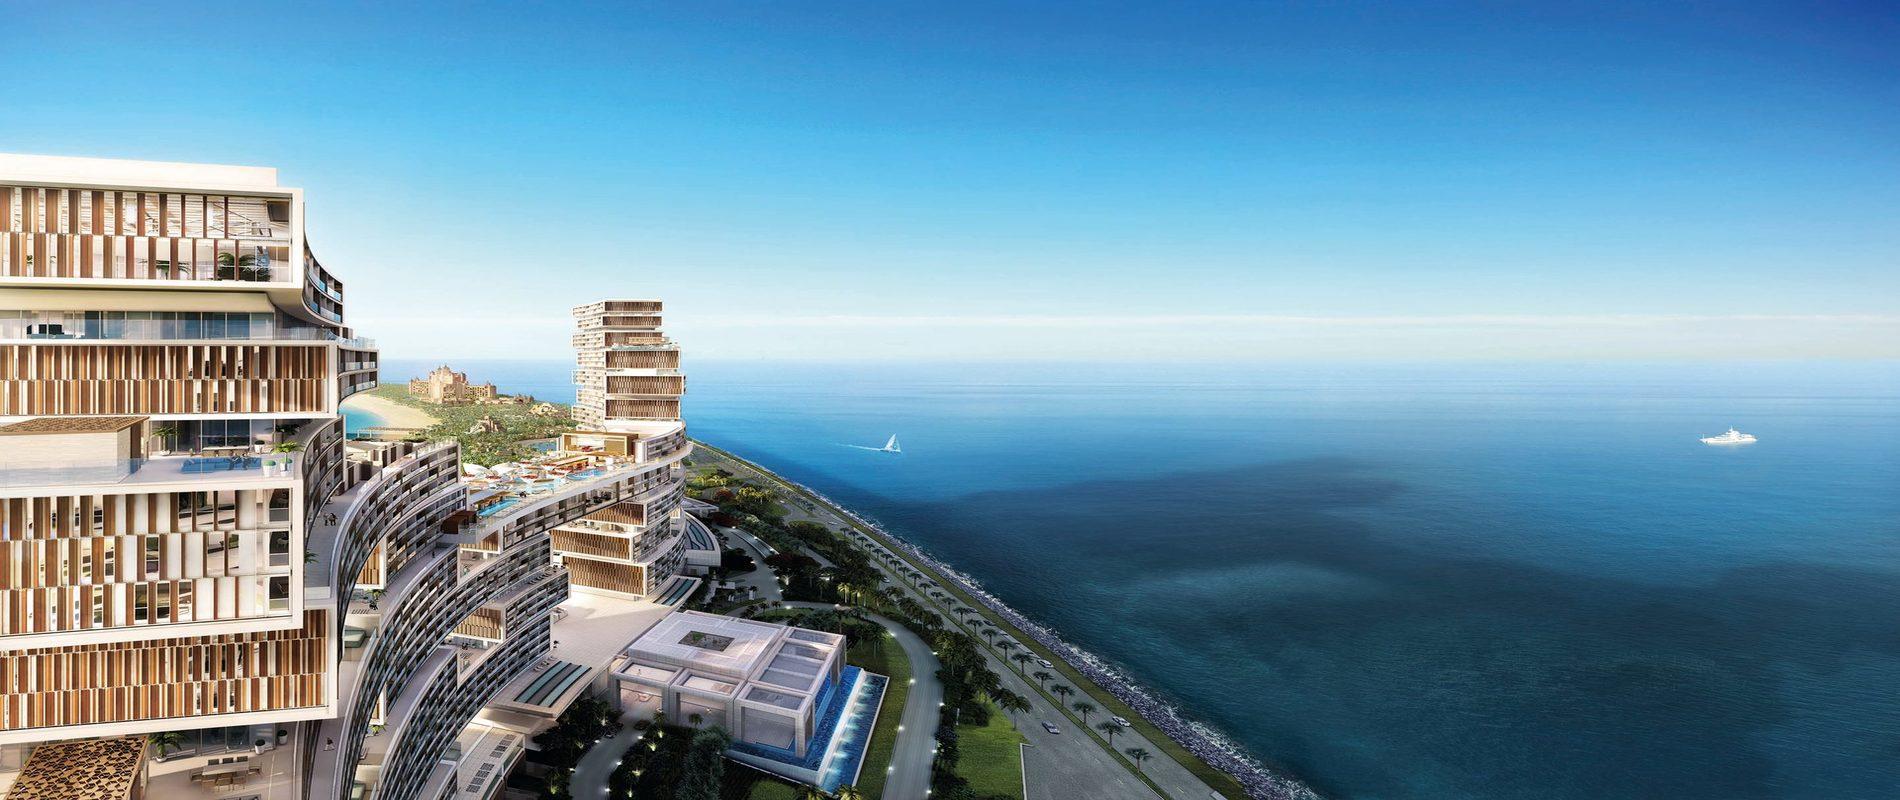 The Royal Atlantis Residences